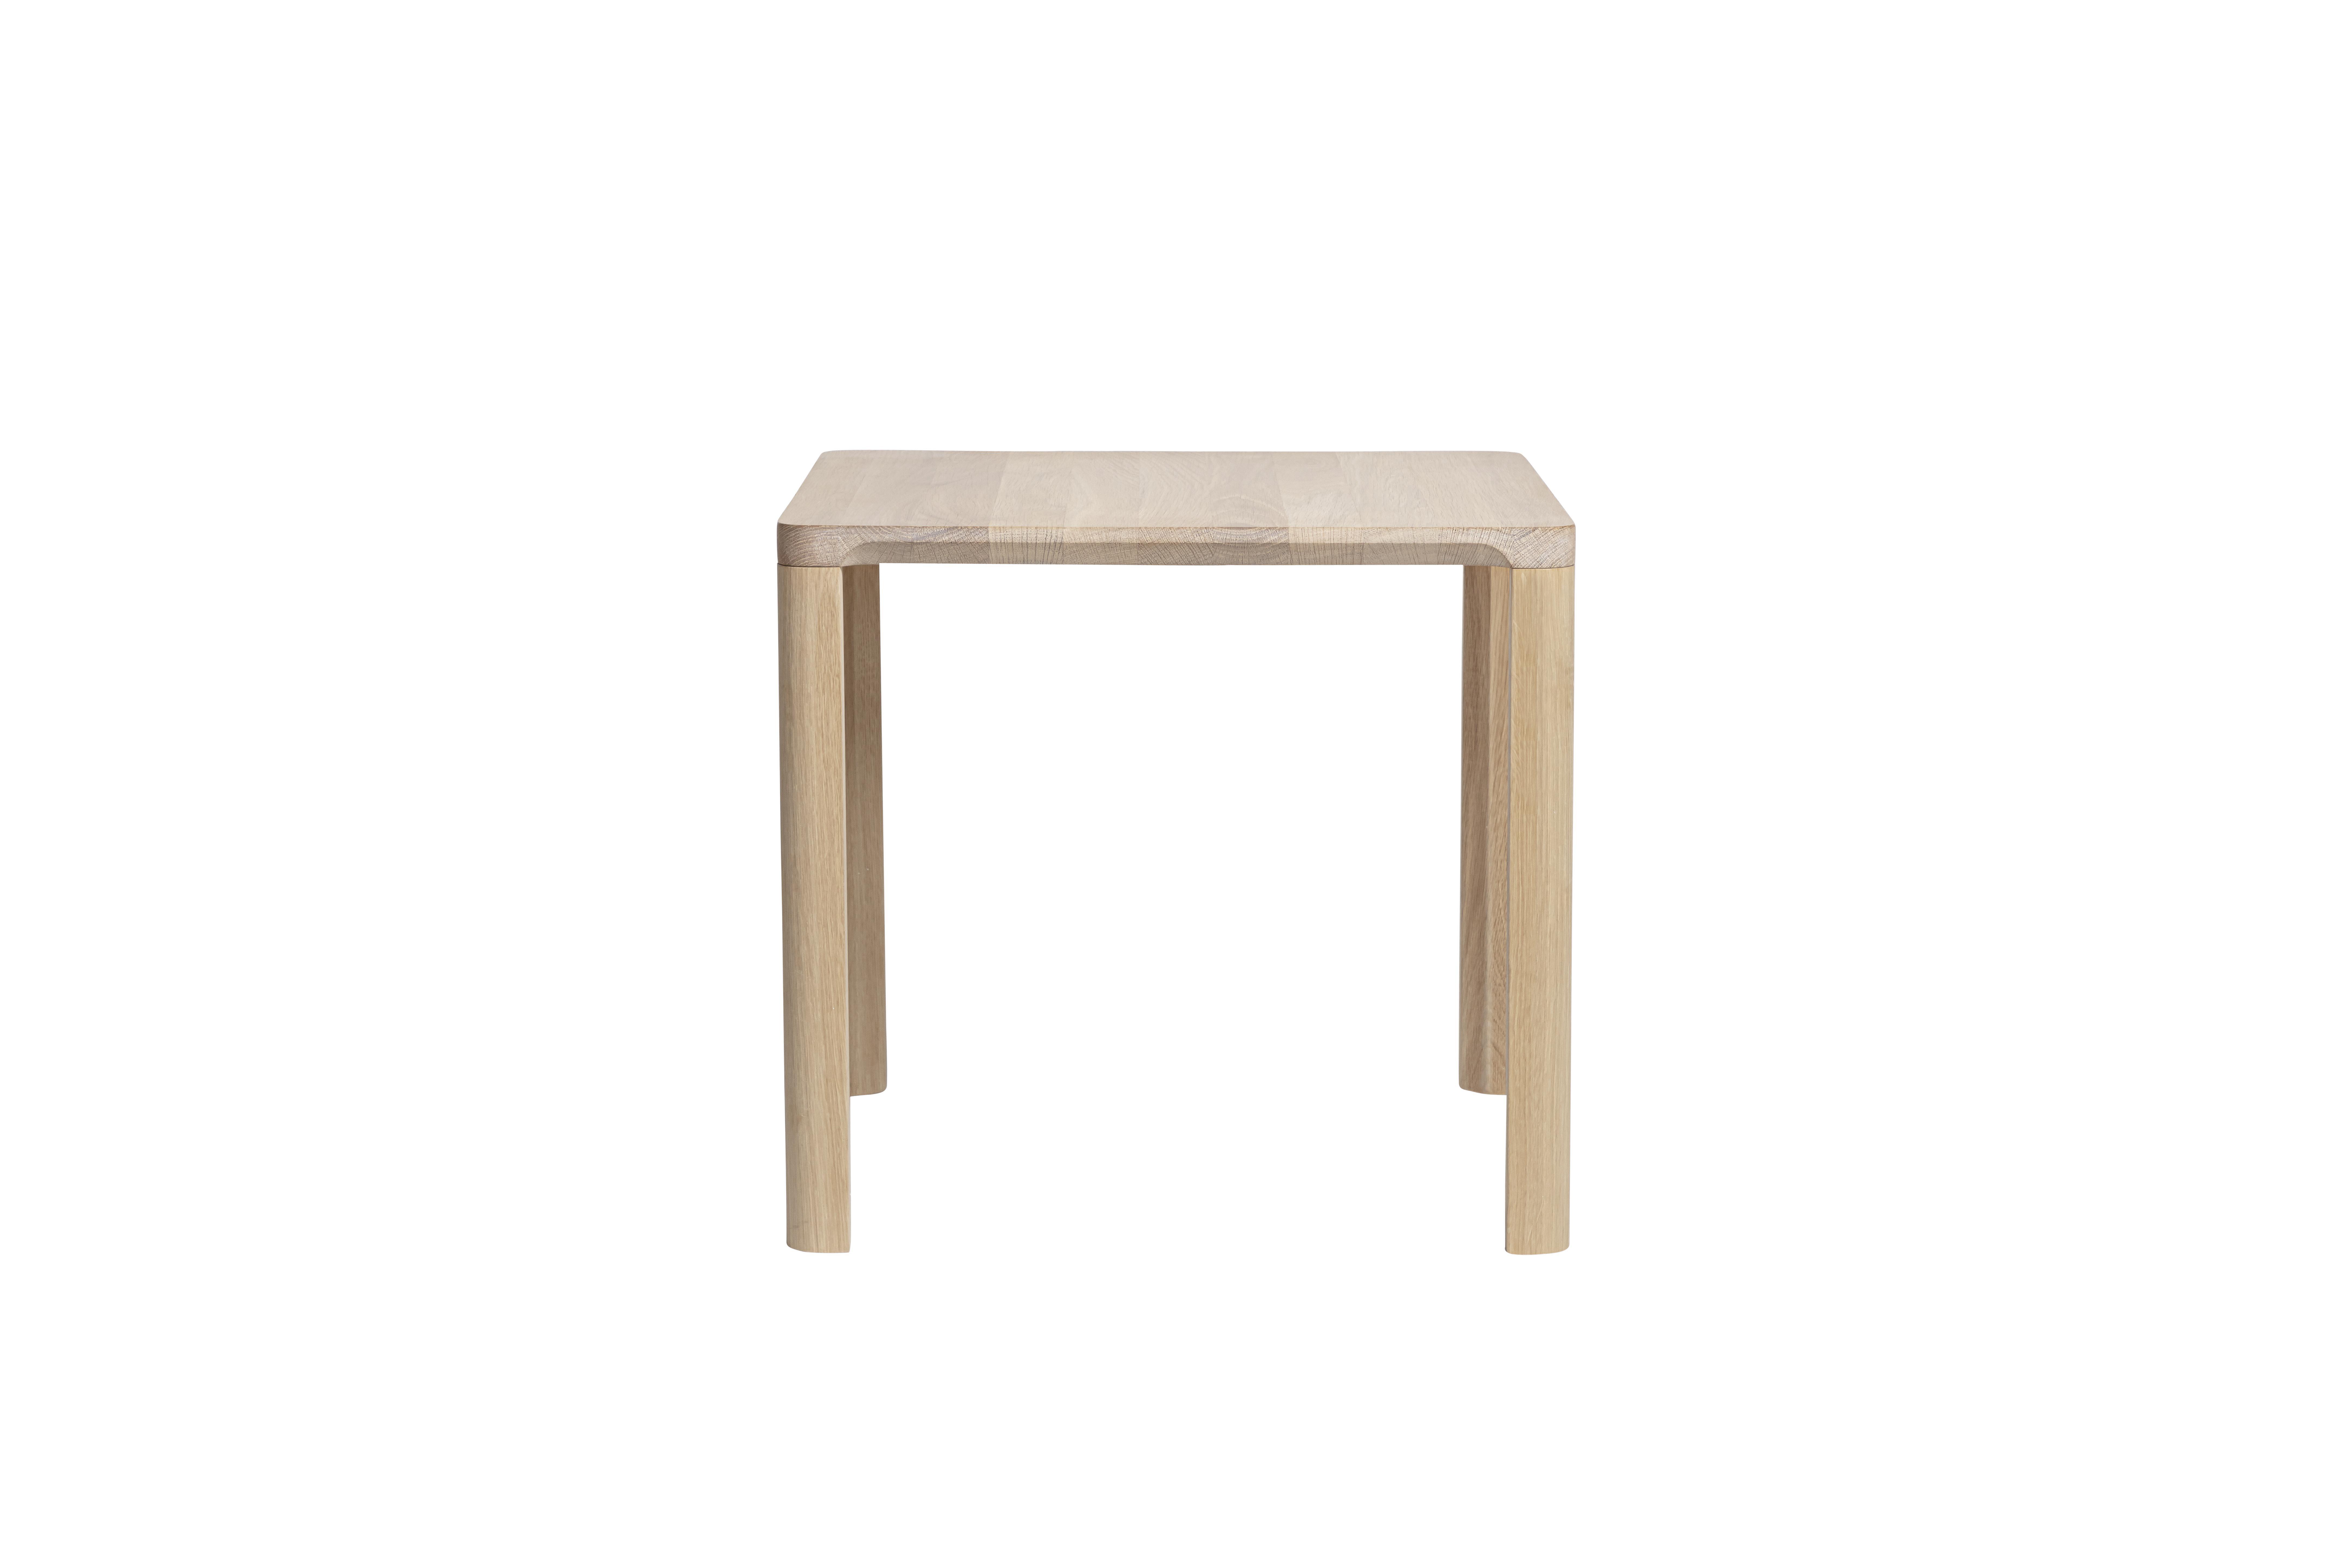 Magnus Olesen, Slender Coffee Table